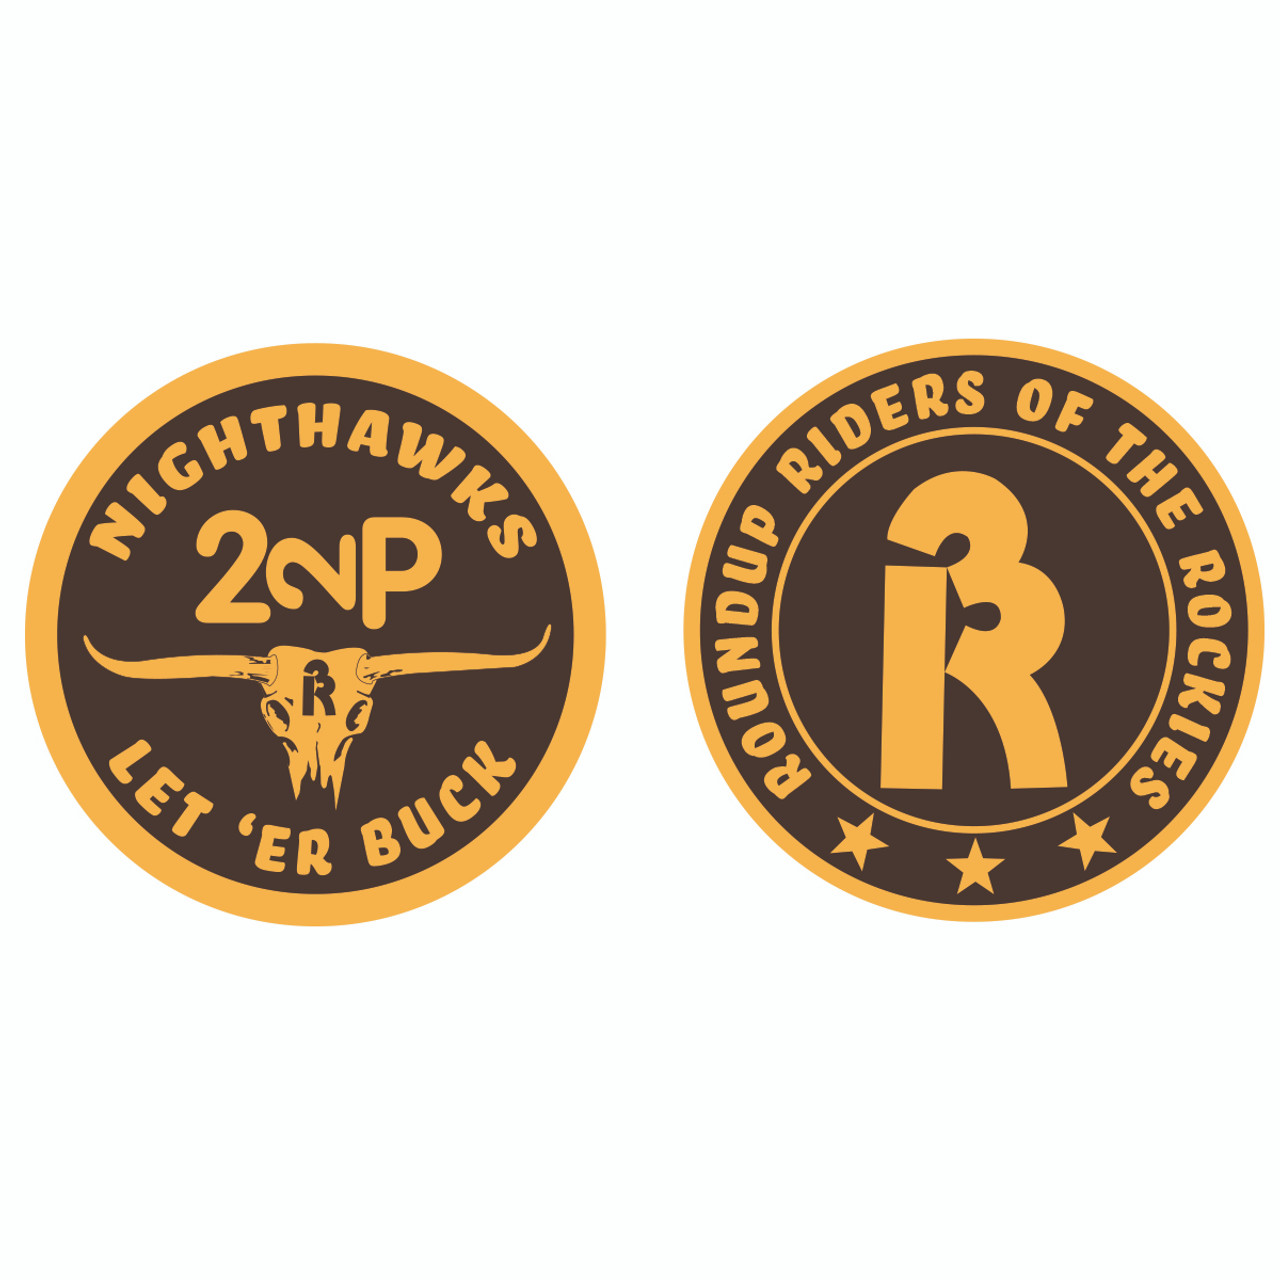 Nighthawks 3R Coin BRONZE (RESTRICTED)